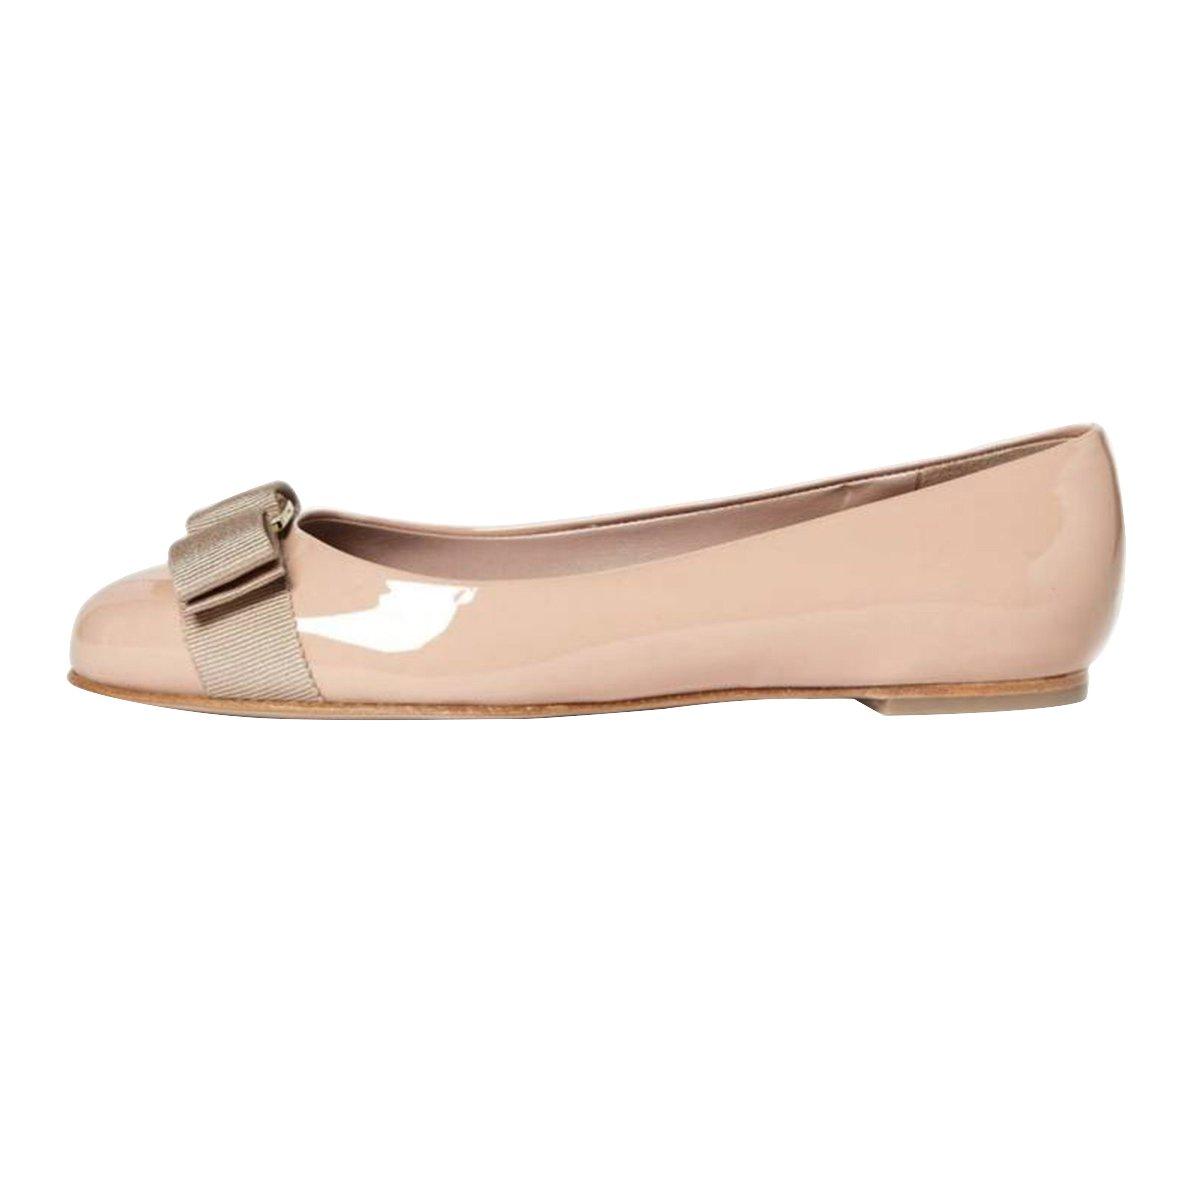 FSJ Women Cute Bowknot Round Toe Comfort Ballet Flats Casual Slip On Ballerina Dress Shoes Size 4-15 US